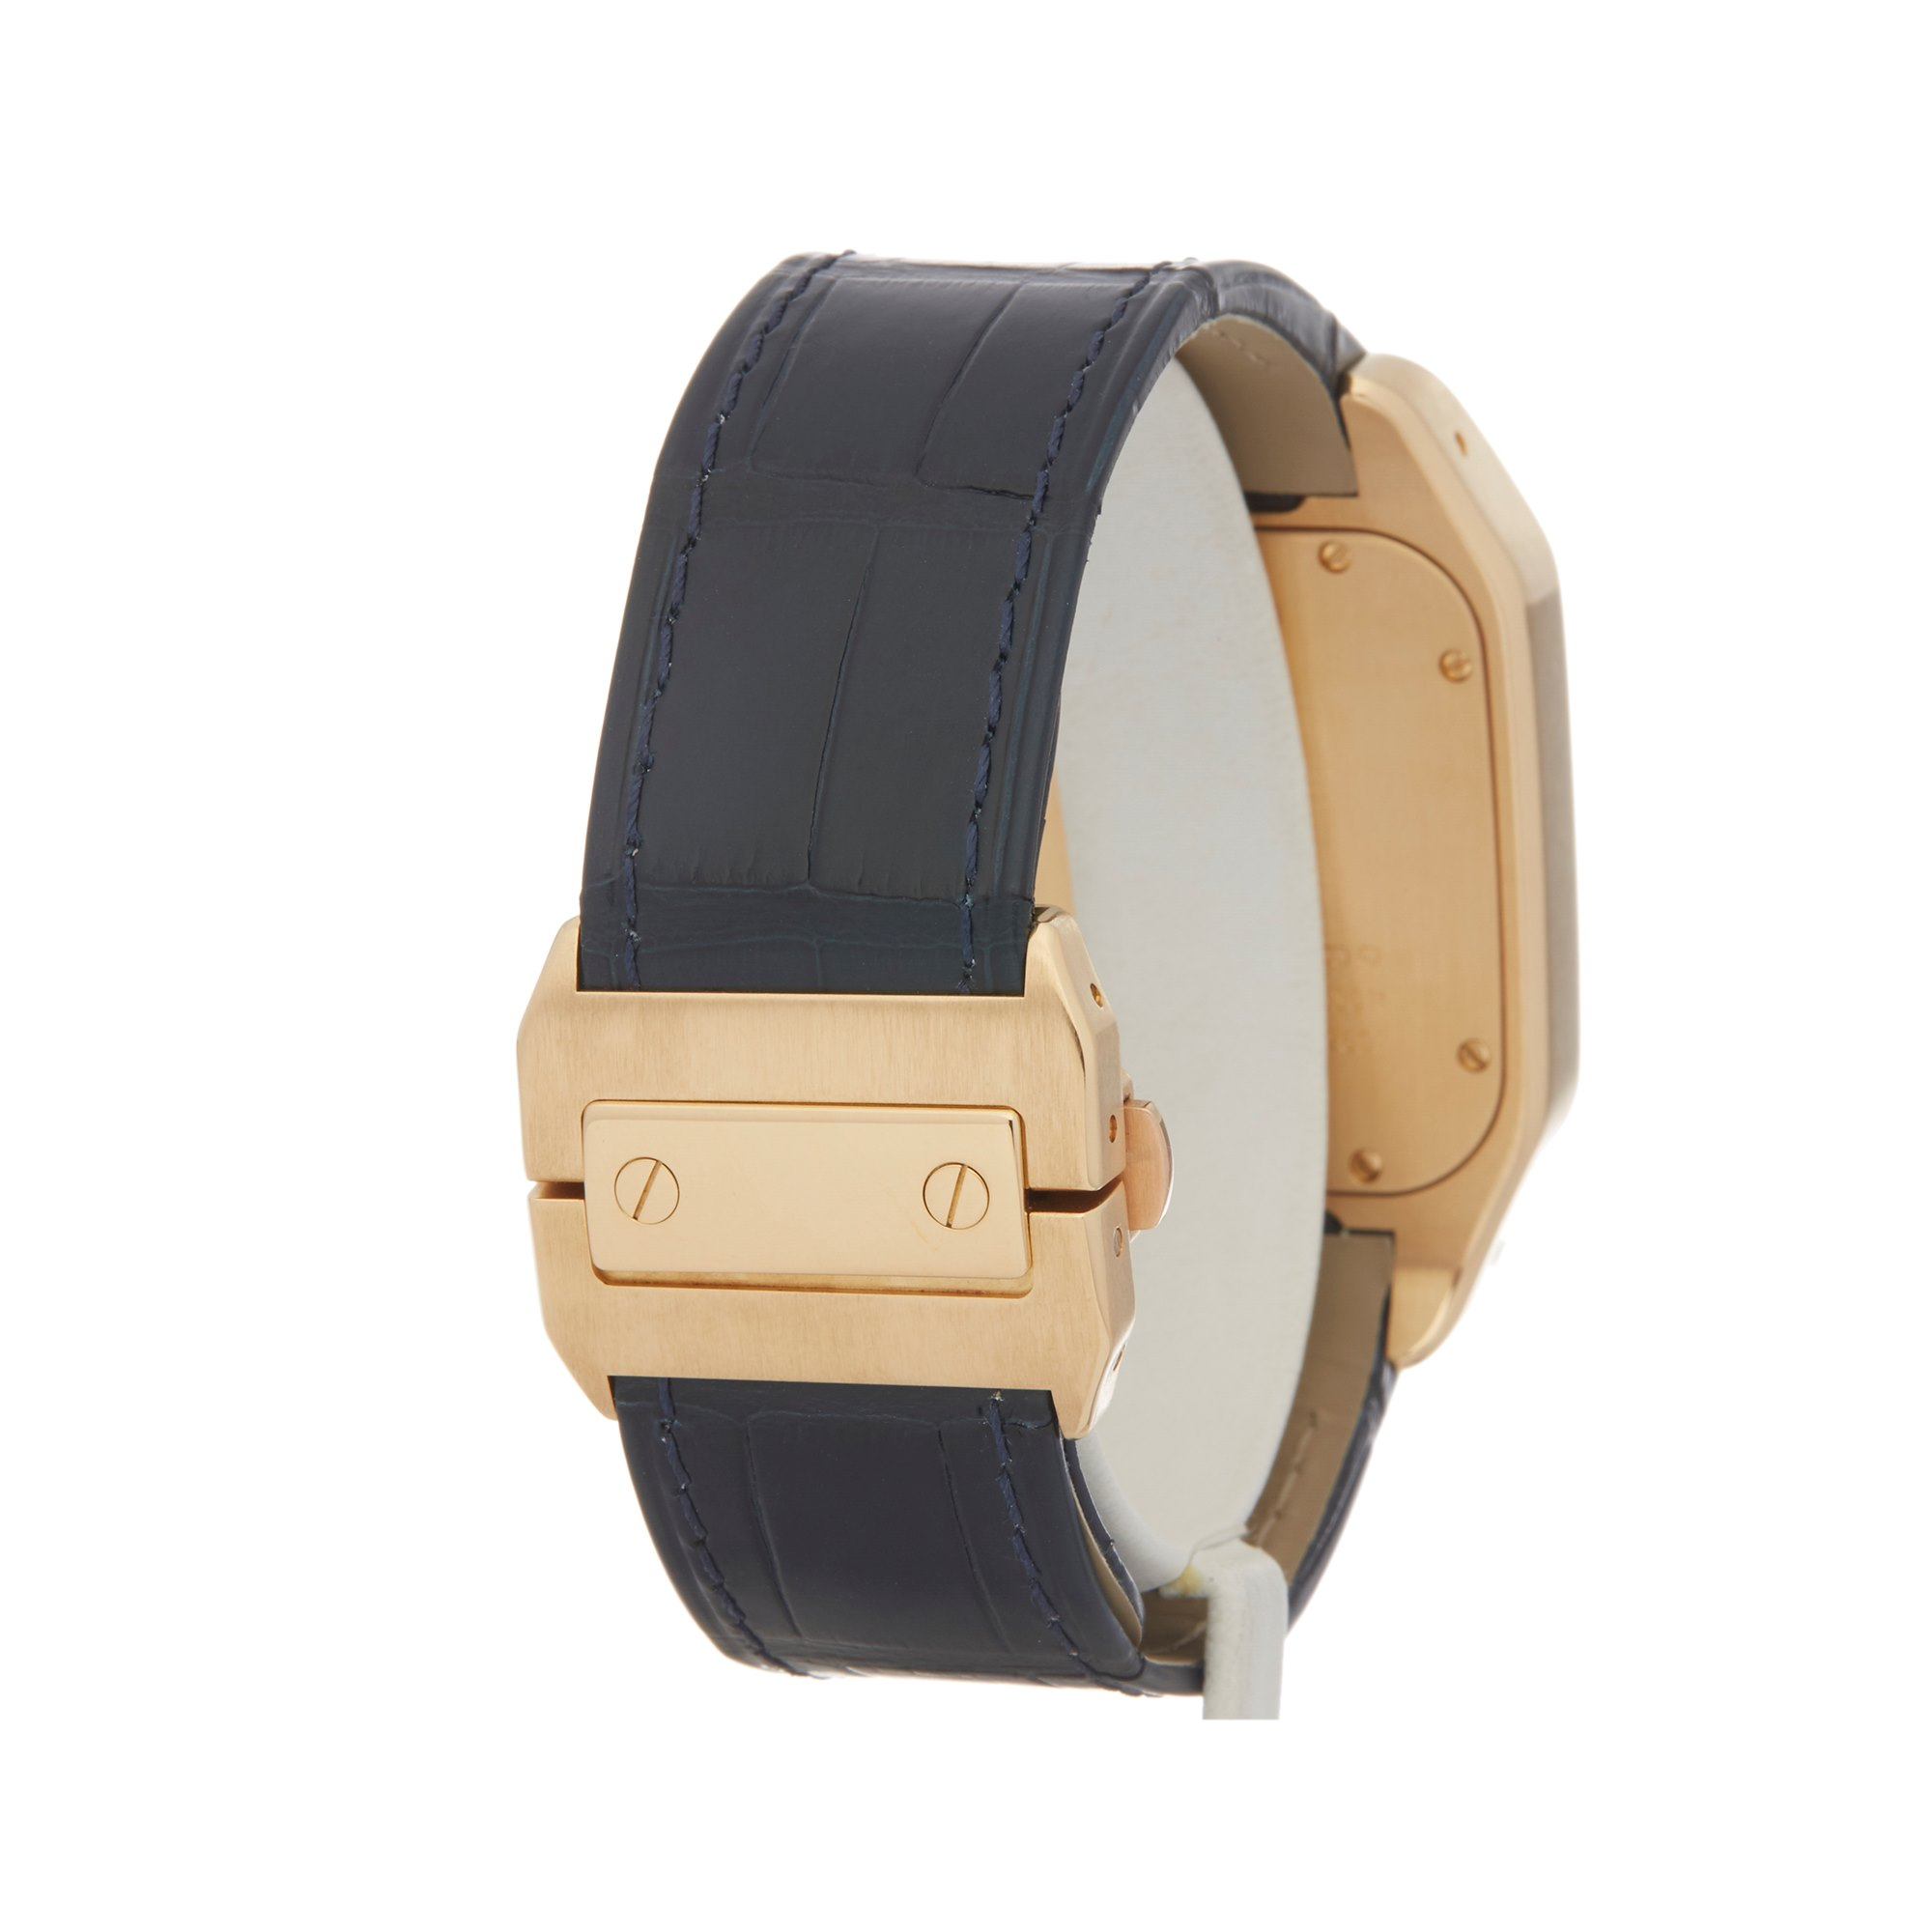 Cartier Santos 100 W20071Y1 or 2657 Men Yellow Gold Watch - Image 5 of 8